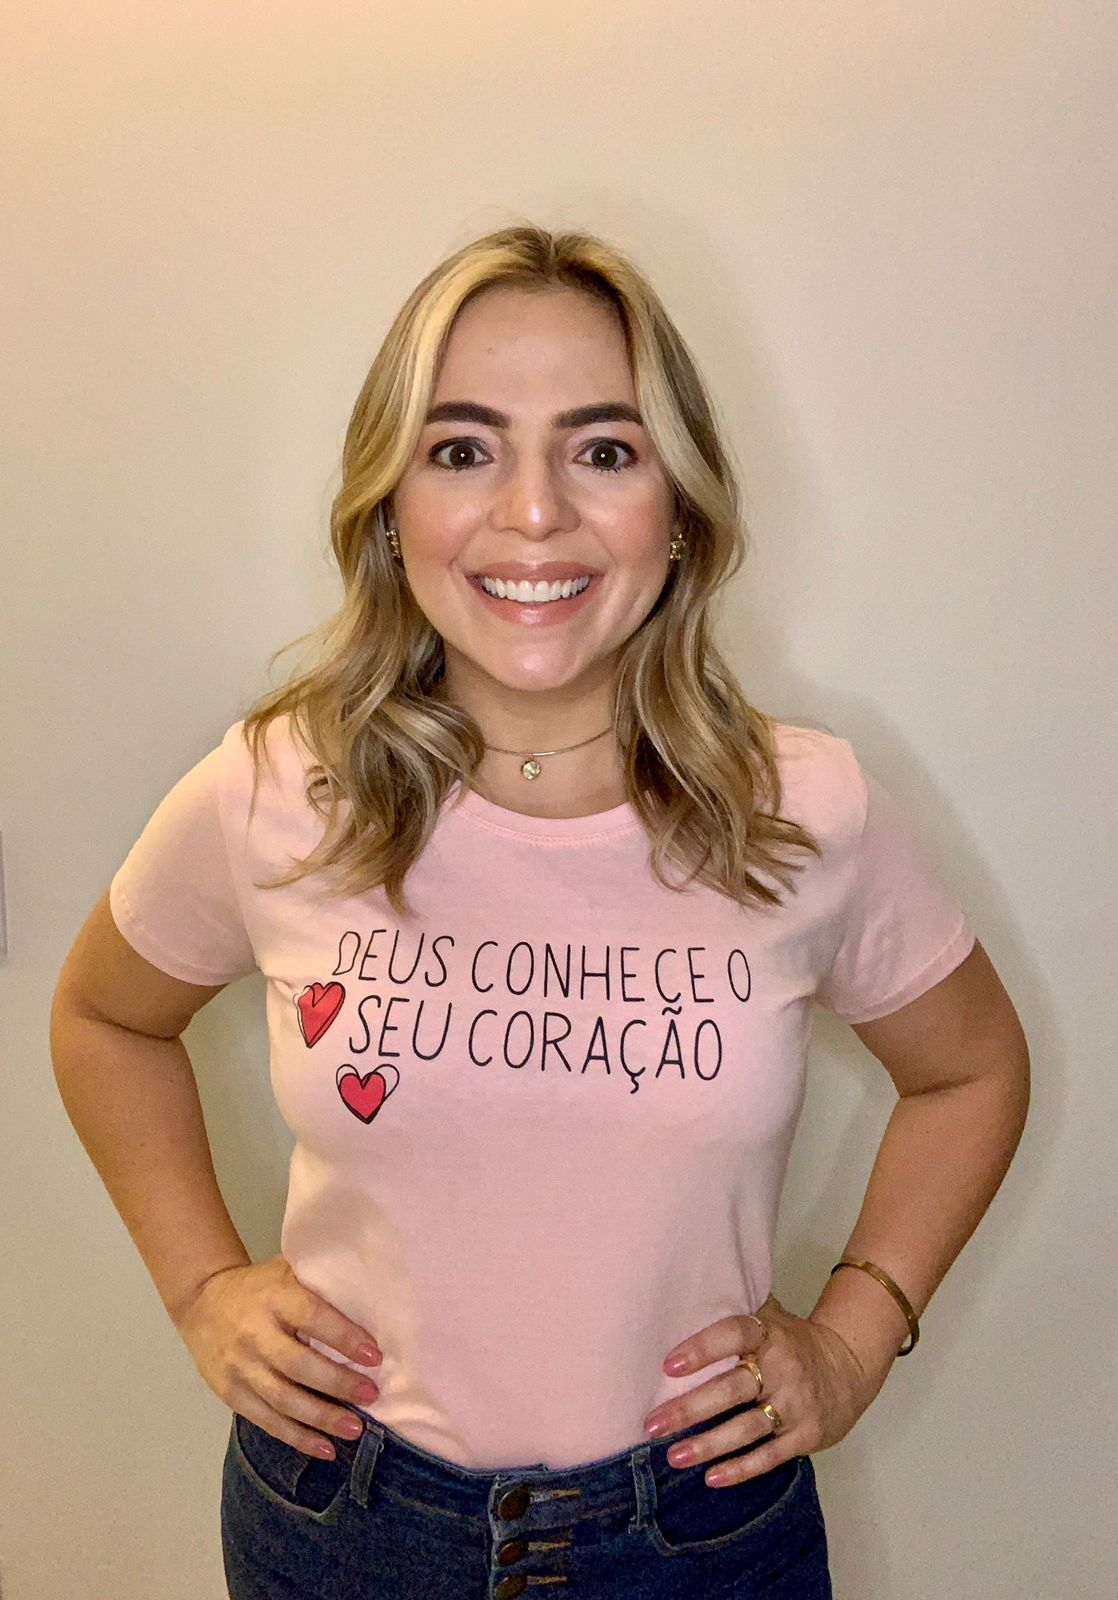 Blusa T-Shirt Rosa Estampa Deus Conhece  Phelps